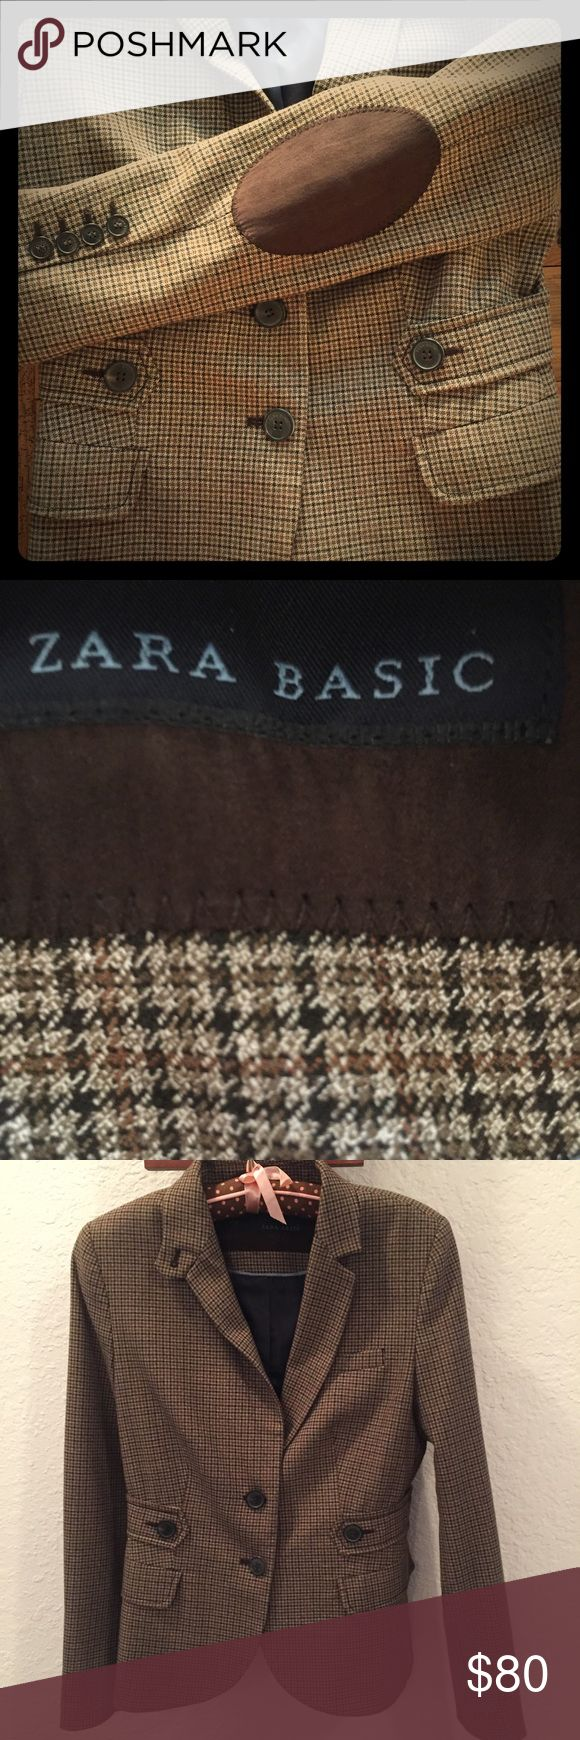 ZARA jacket Never worn or worn once. Just been hanging in my closet. Size S Zara Jackets & Coats Blazers